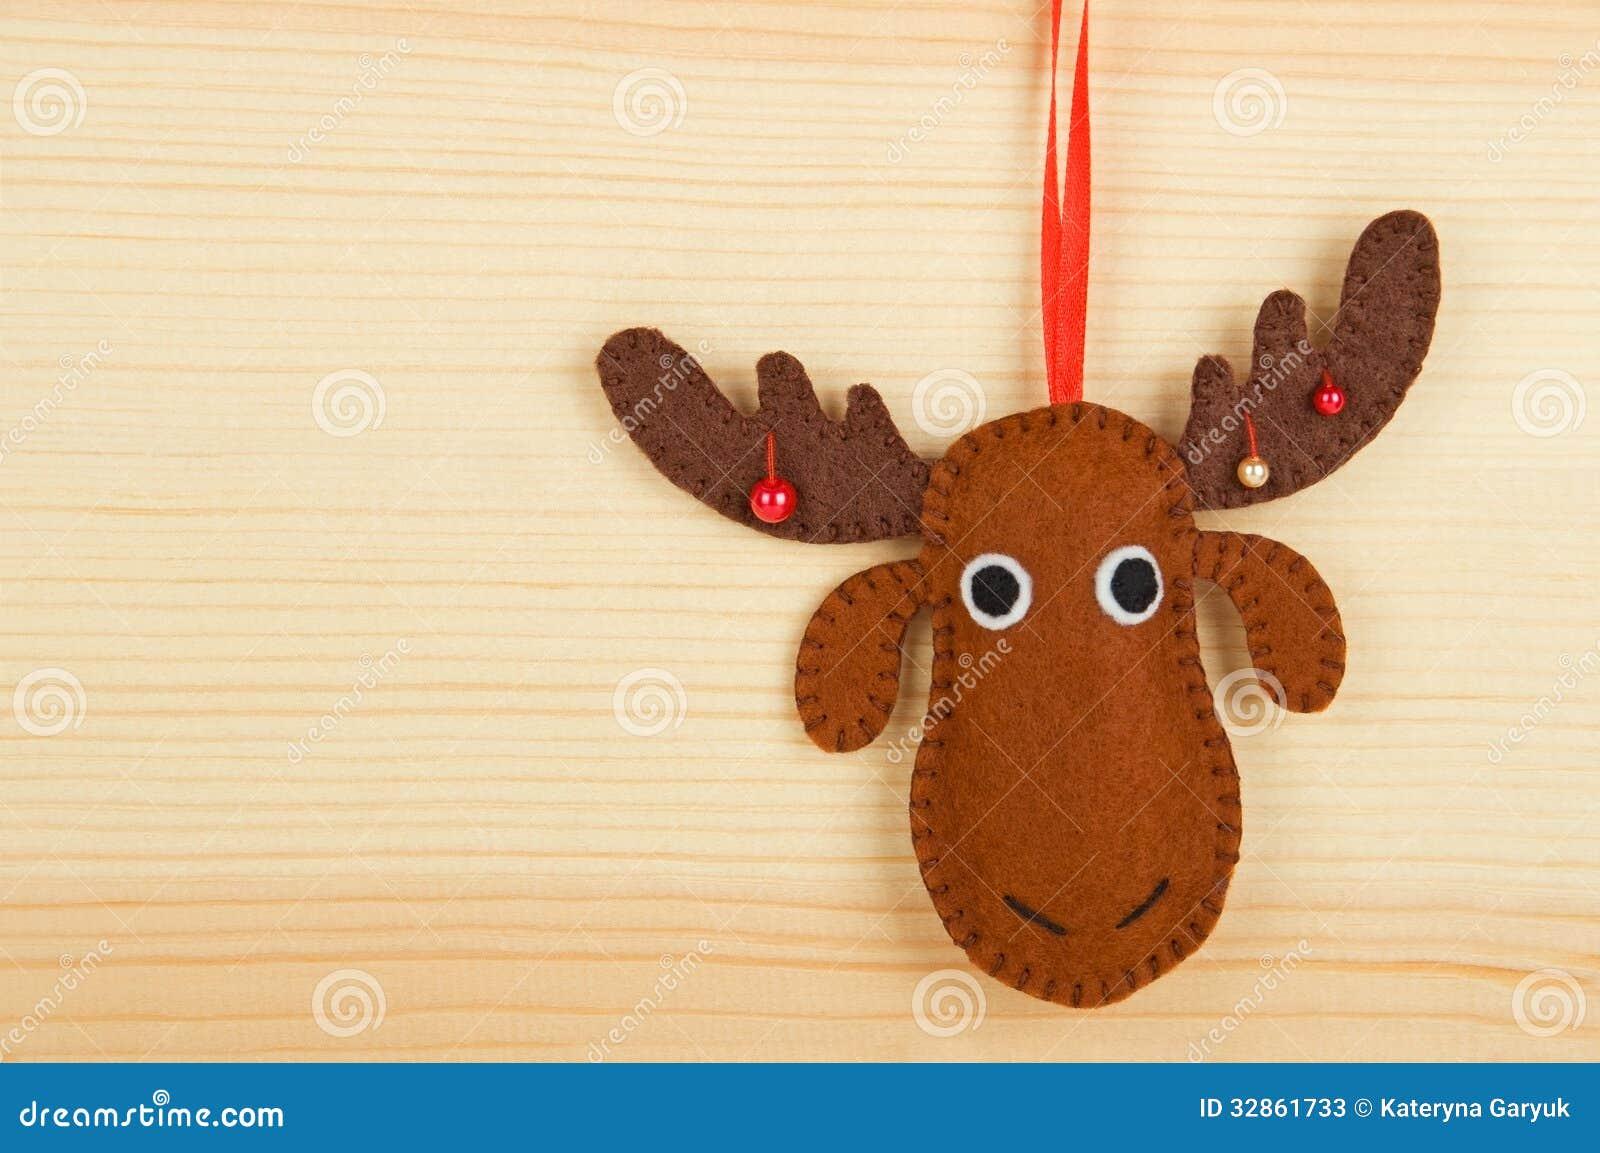 Handmade christmas decorations stock photos image 32861733 for Handmade decoration